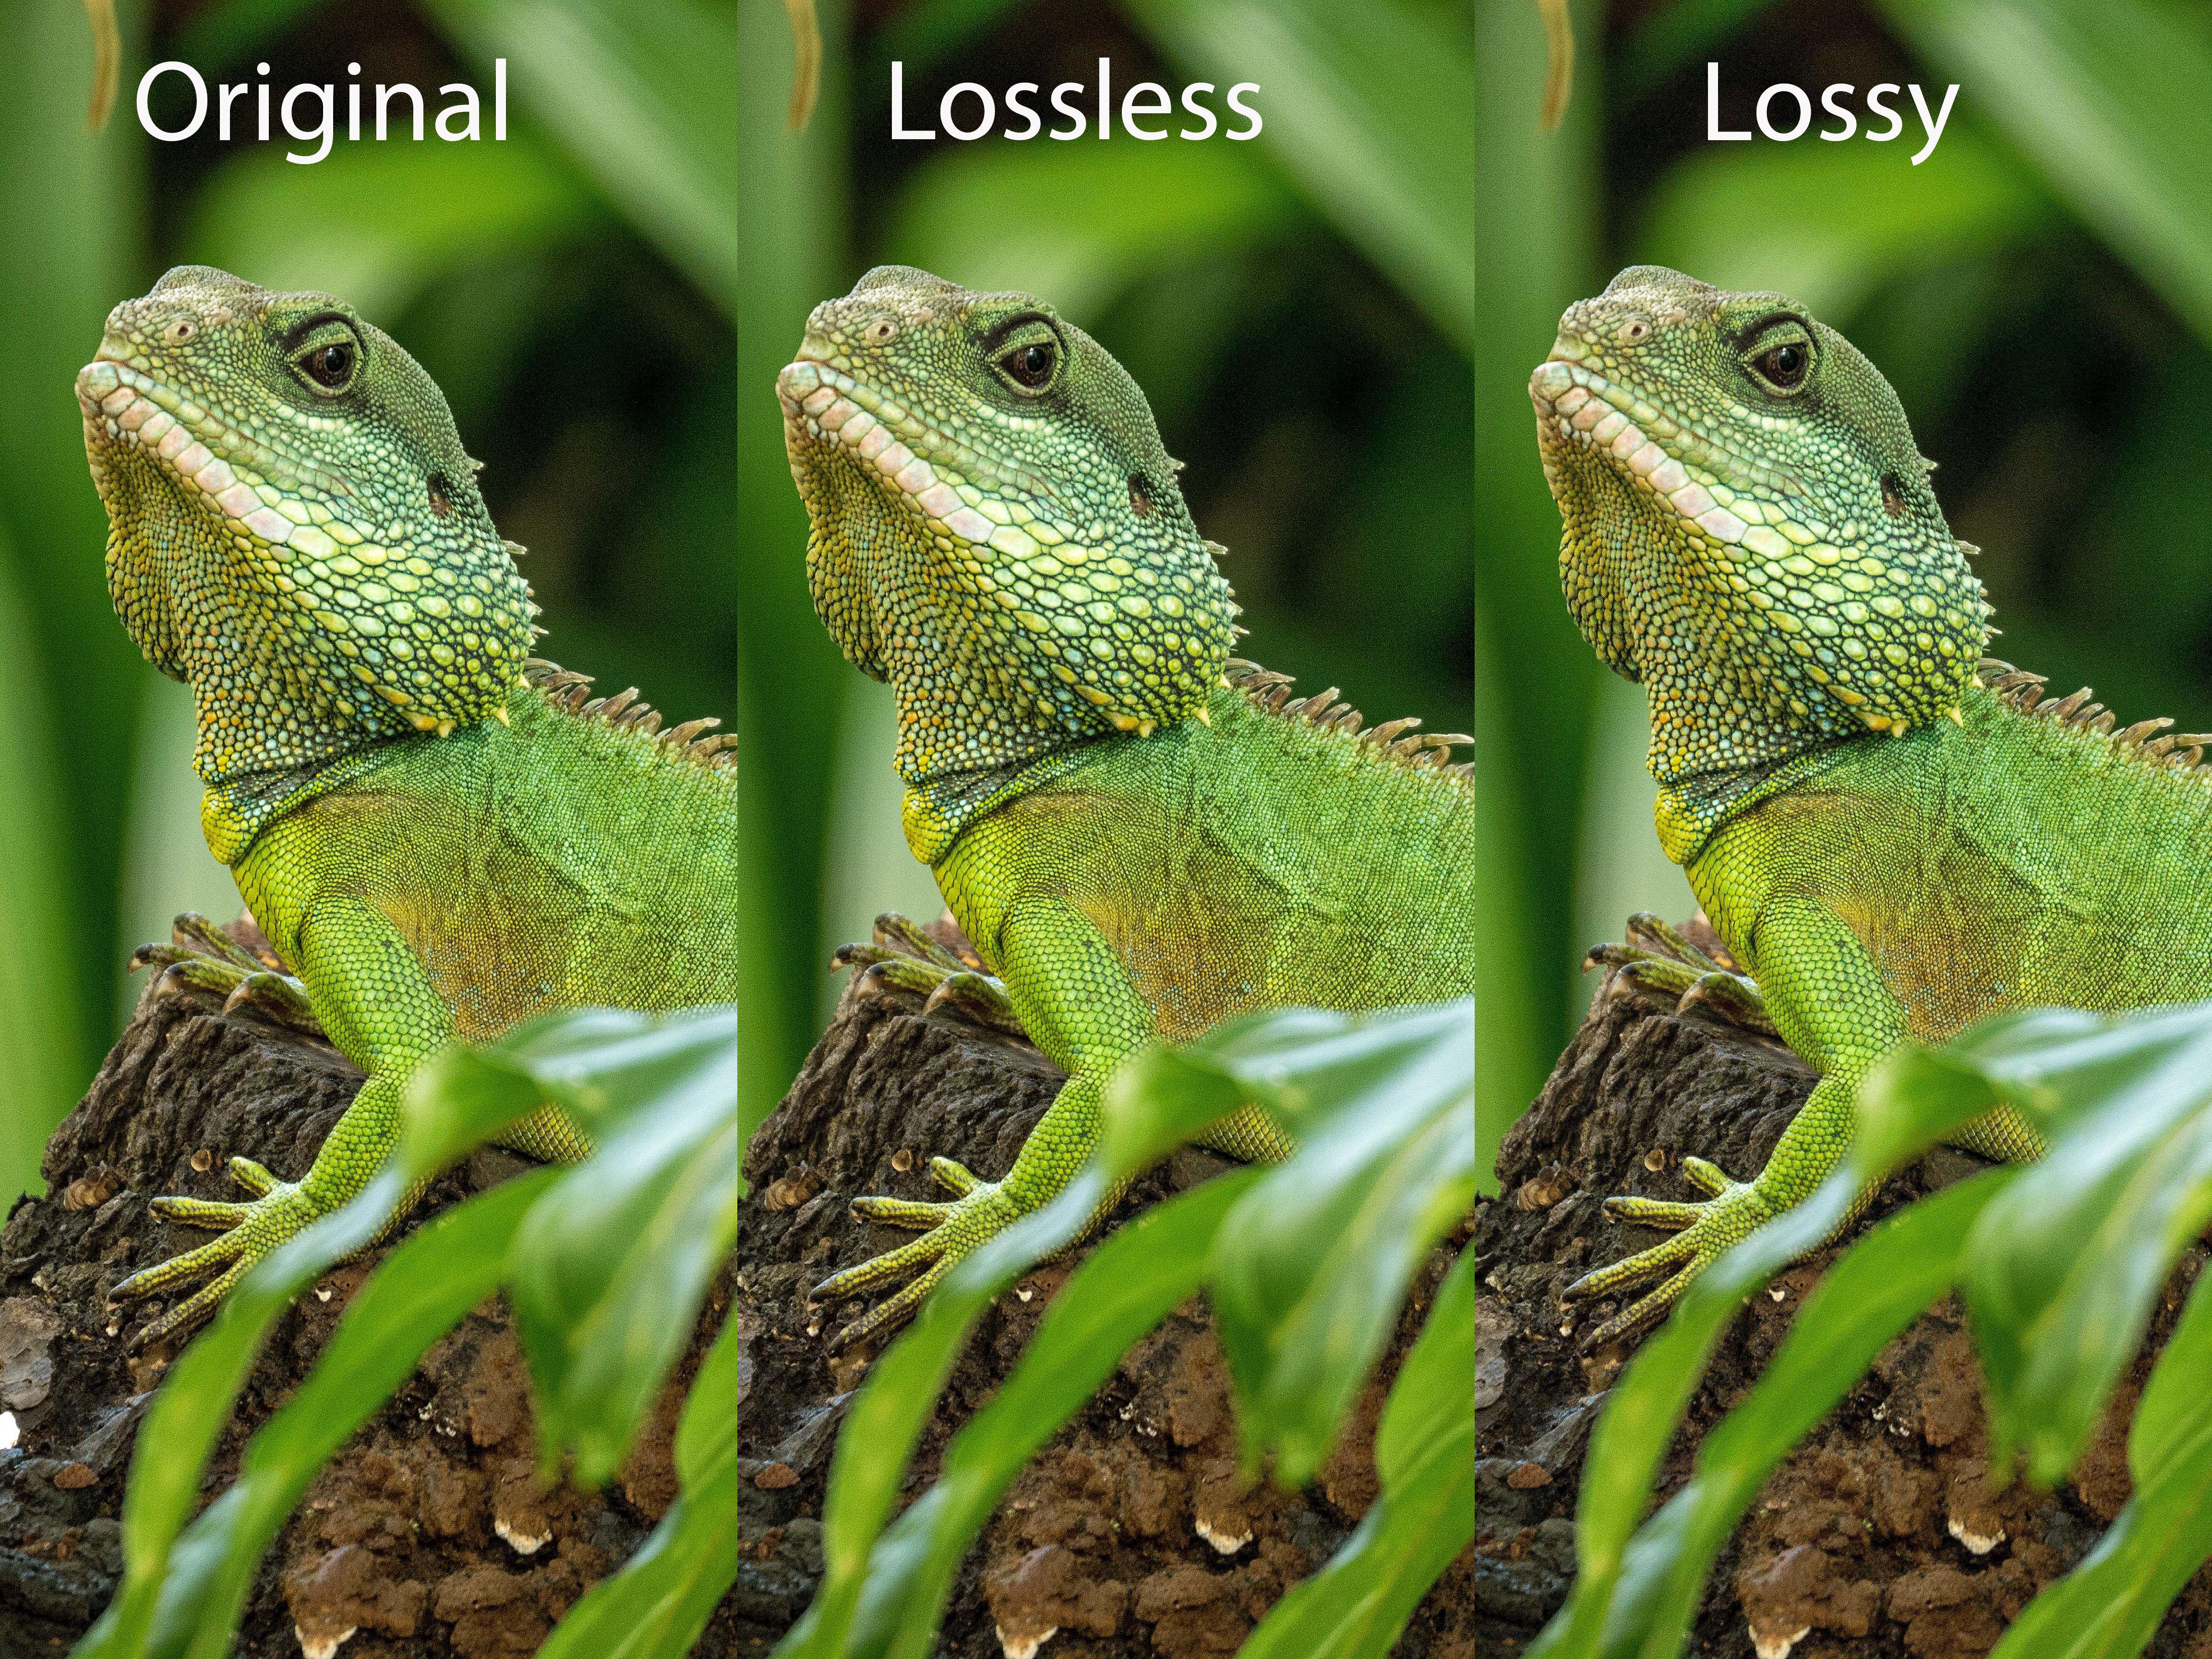 JPEG image size reduction with ShortPixel - My Blog